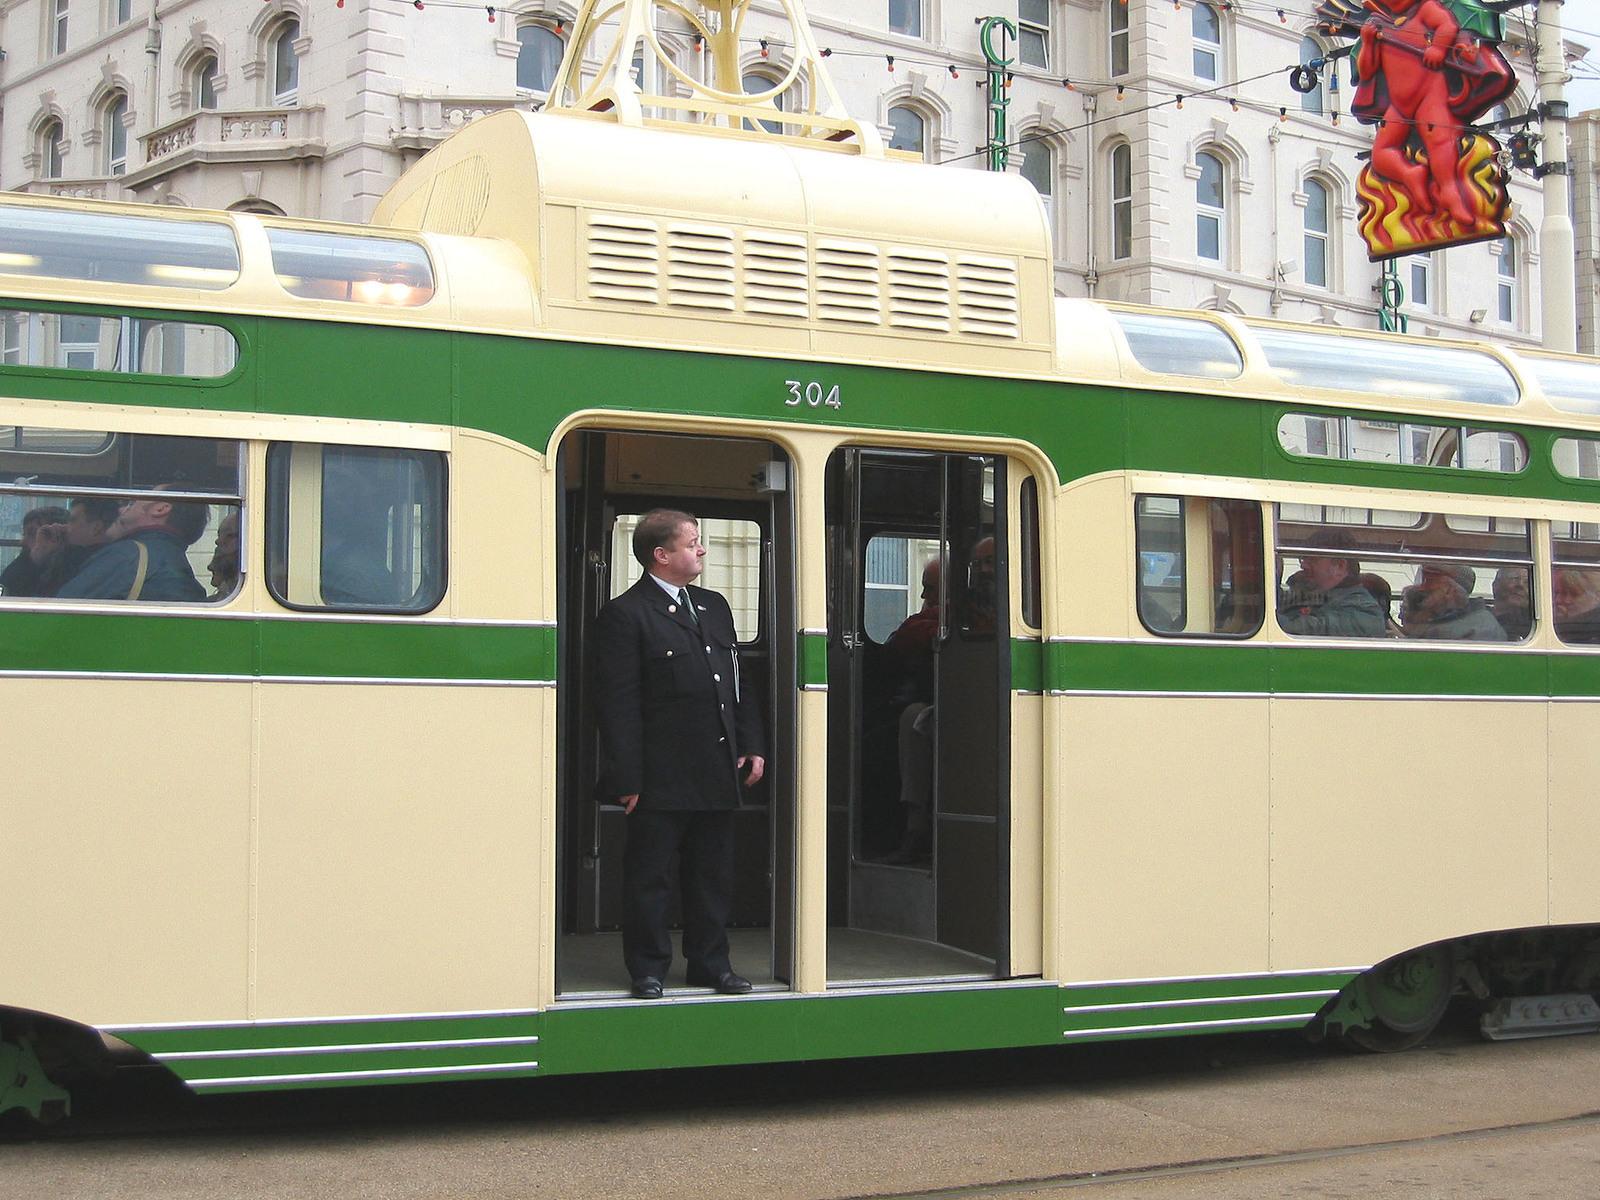 Tram304-3